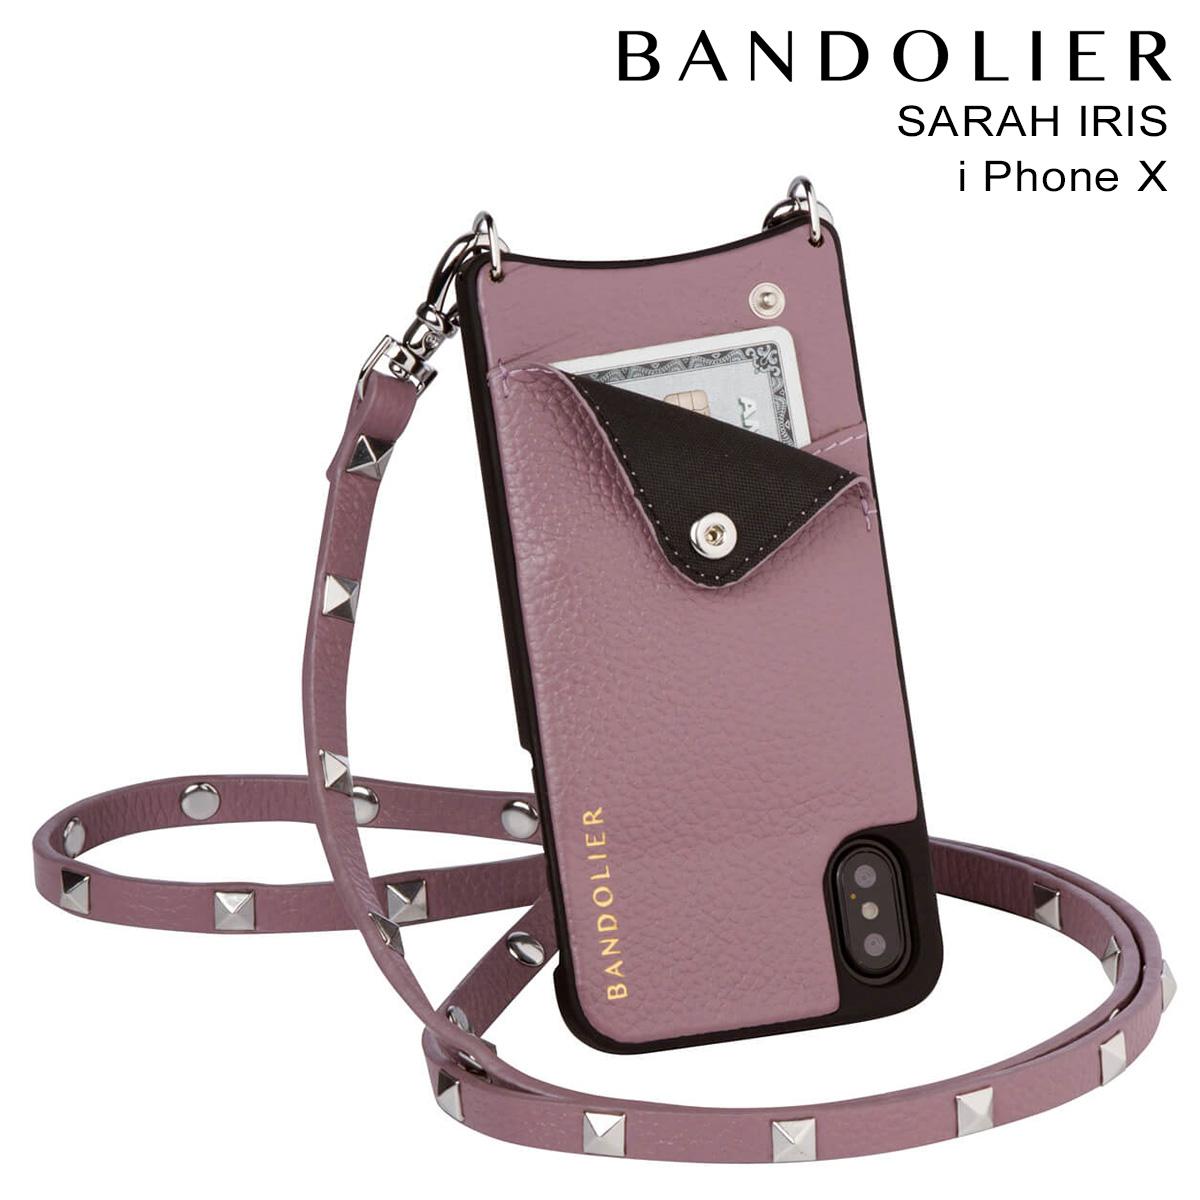 BANDOLIER iPhoneX SARAH IRIS バンドリヤー ケース スマホ アイフォン レザー メンズ レディース